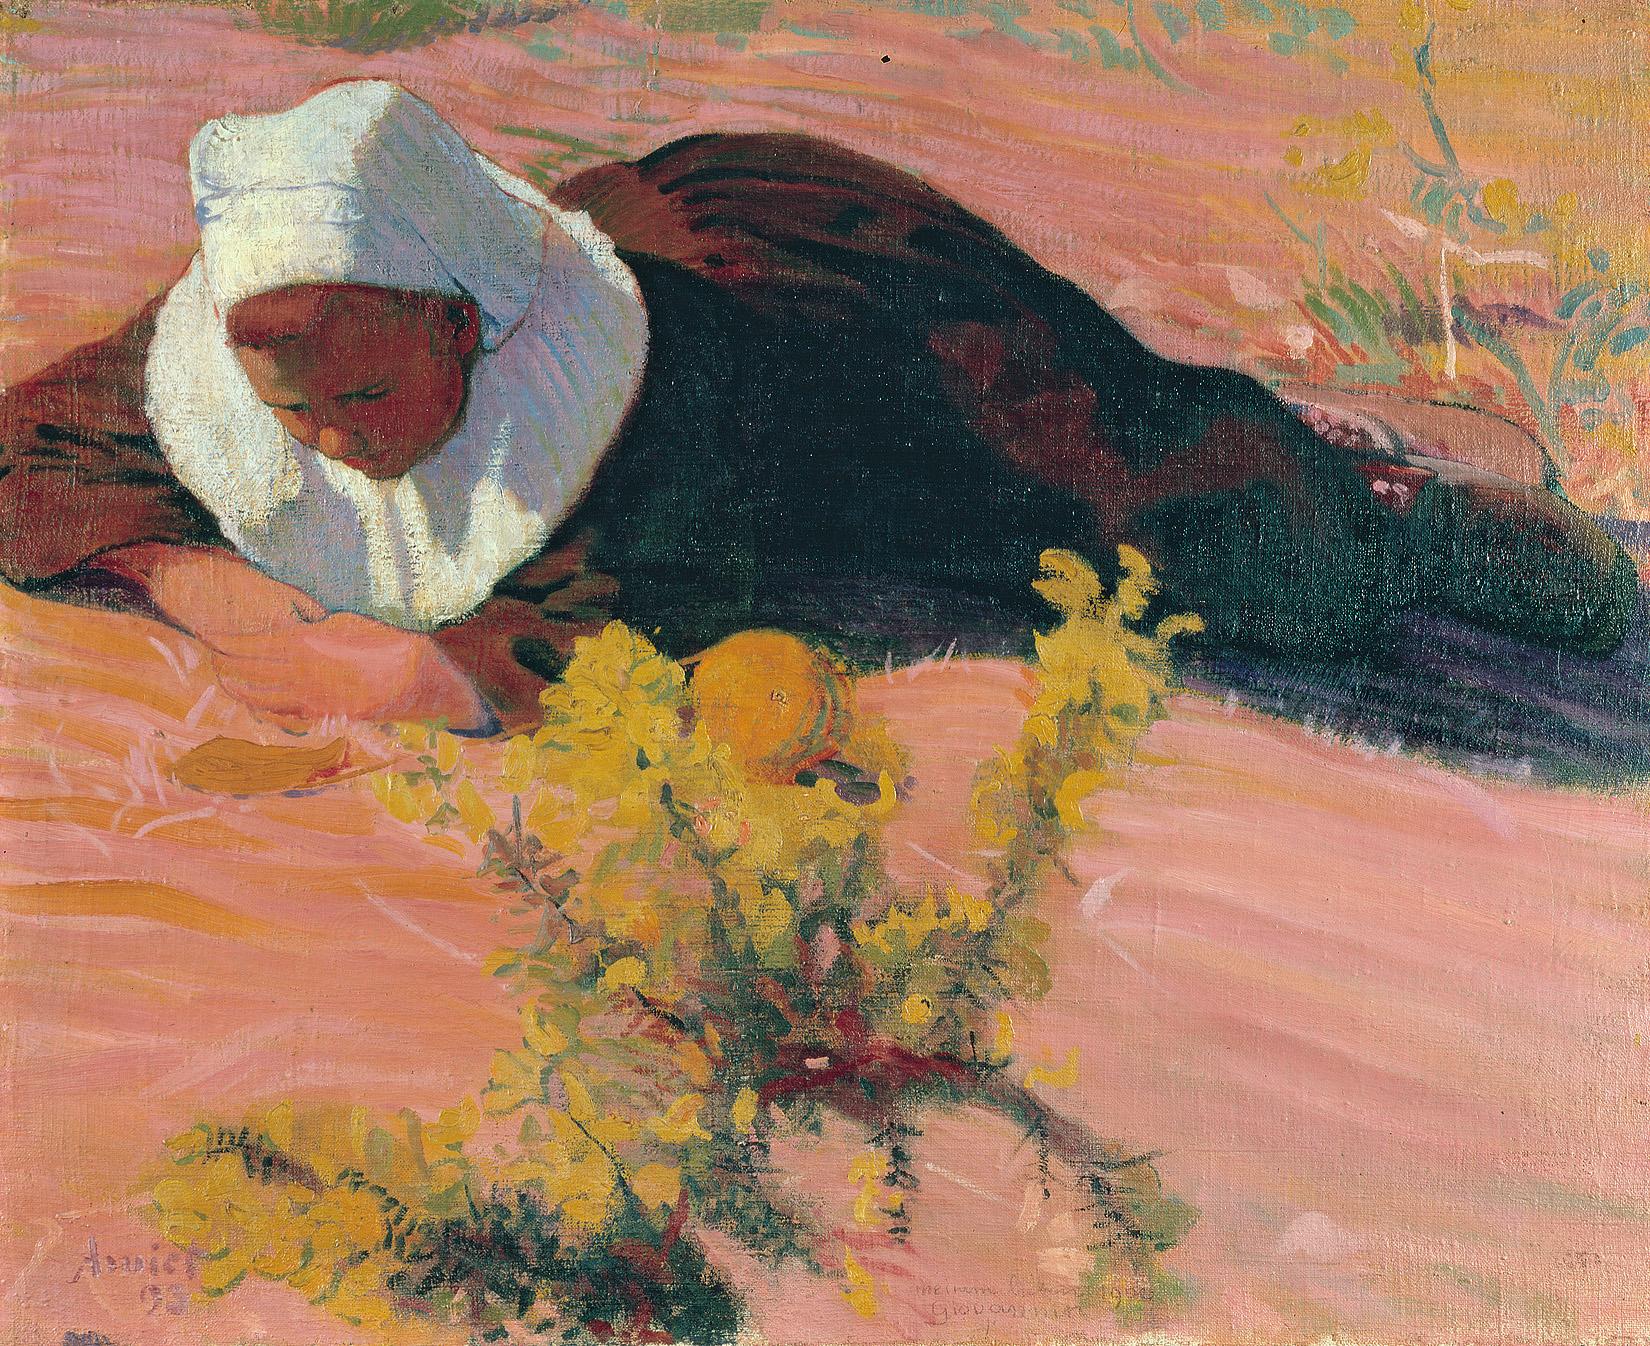 Cuno Amiet, Breton Woman Lying Down, 1893, Kunsthaus Zurich